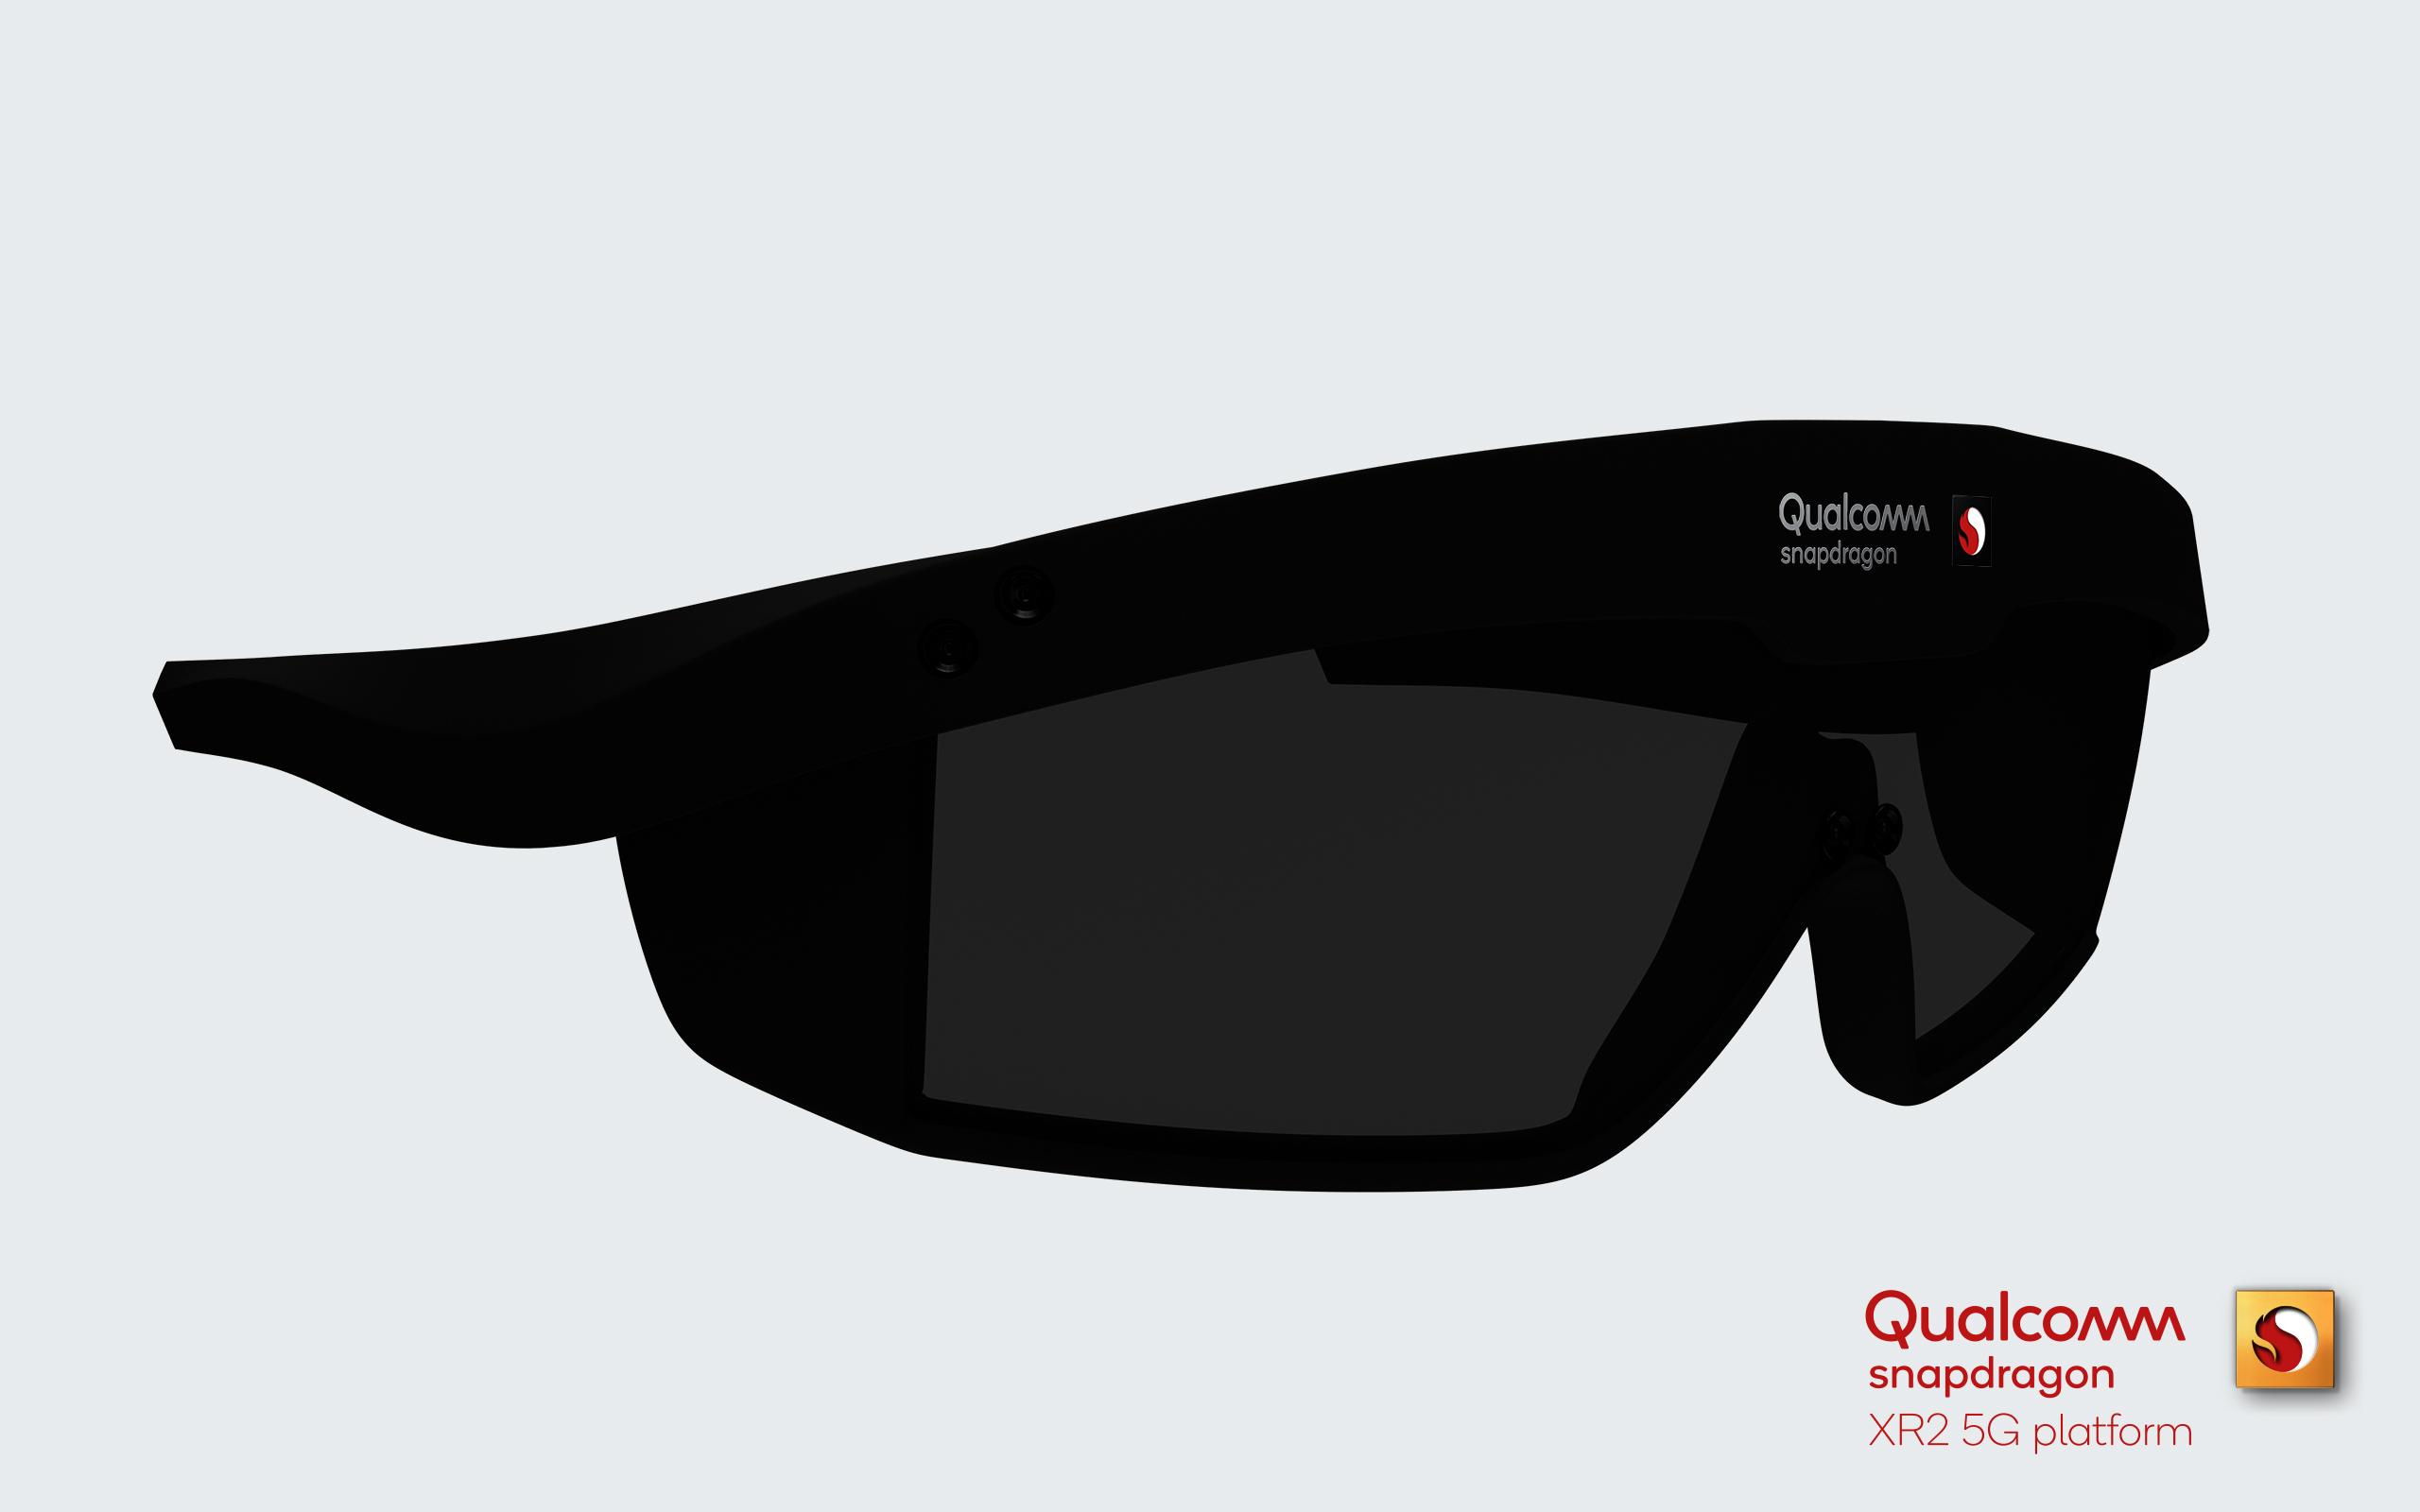 Qualcomm Snapdragon XR2 Concept